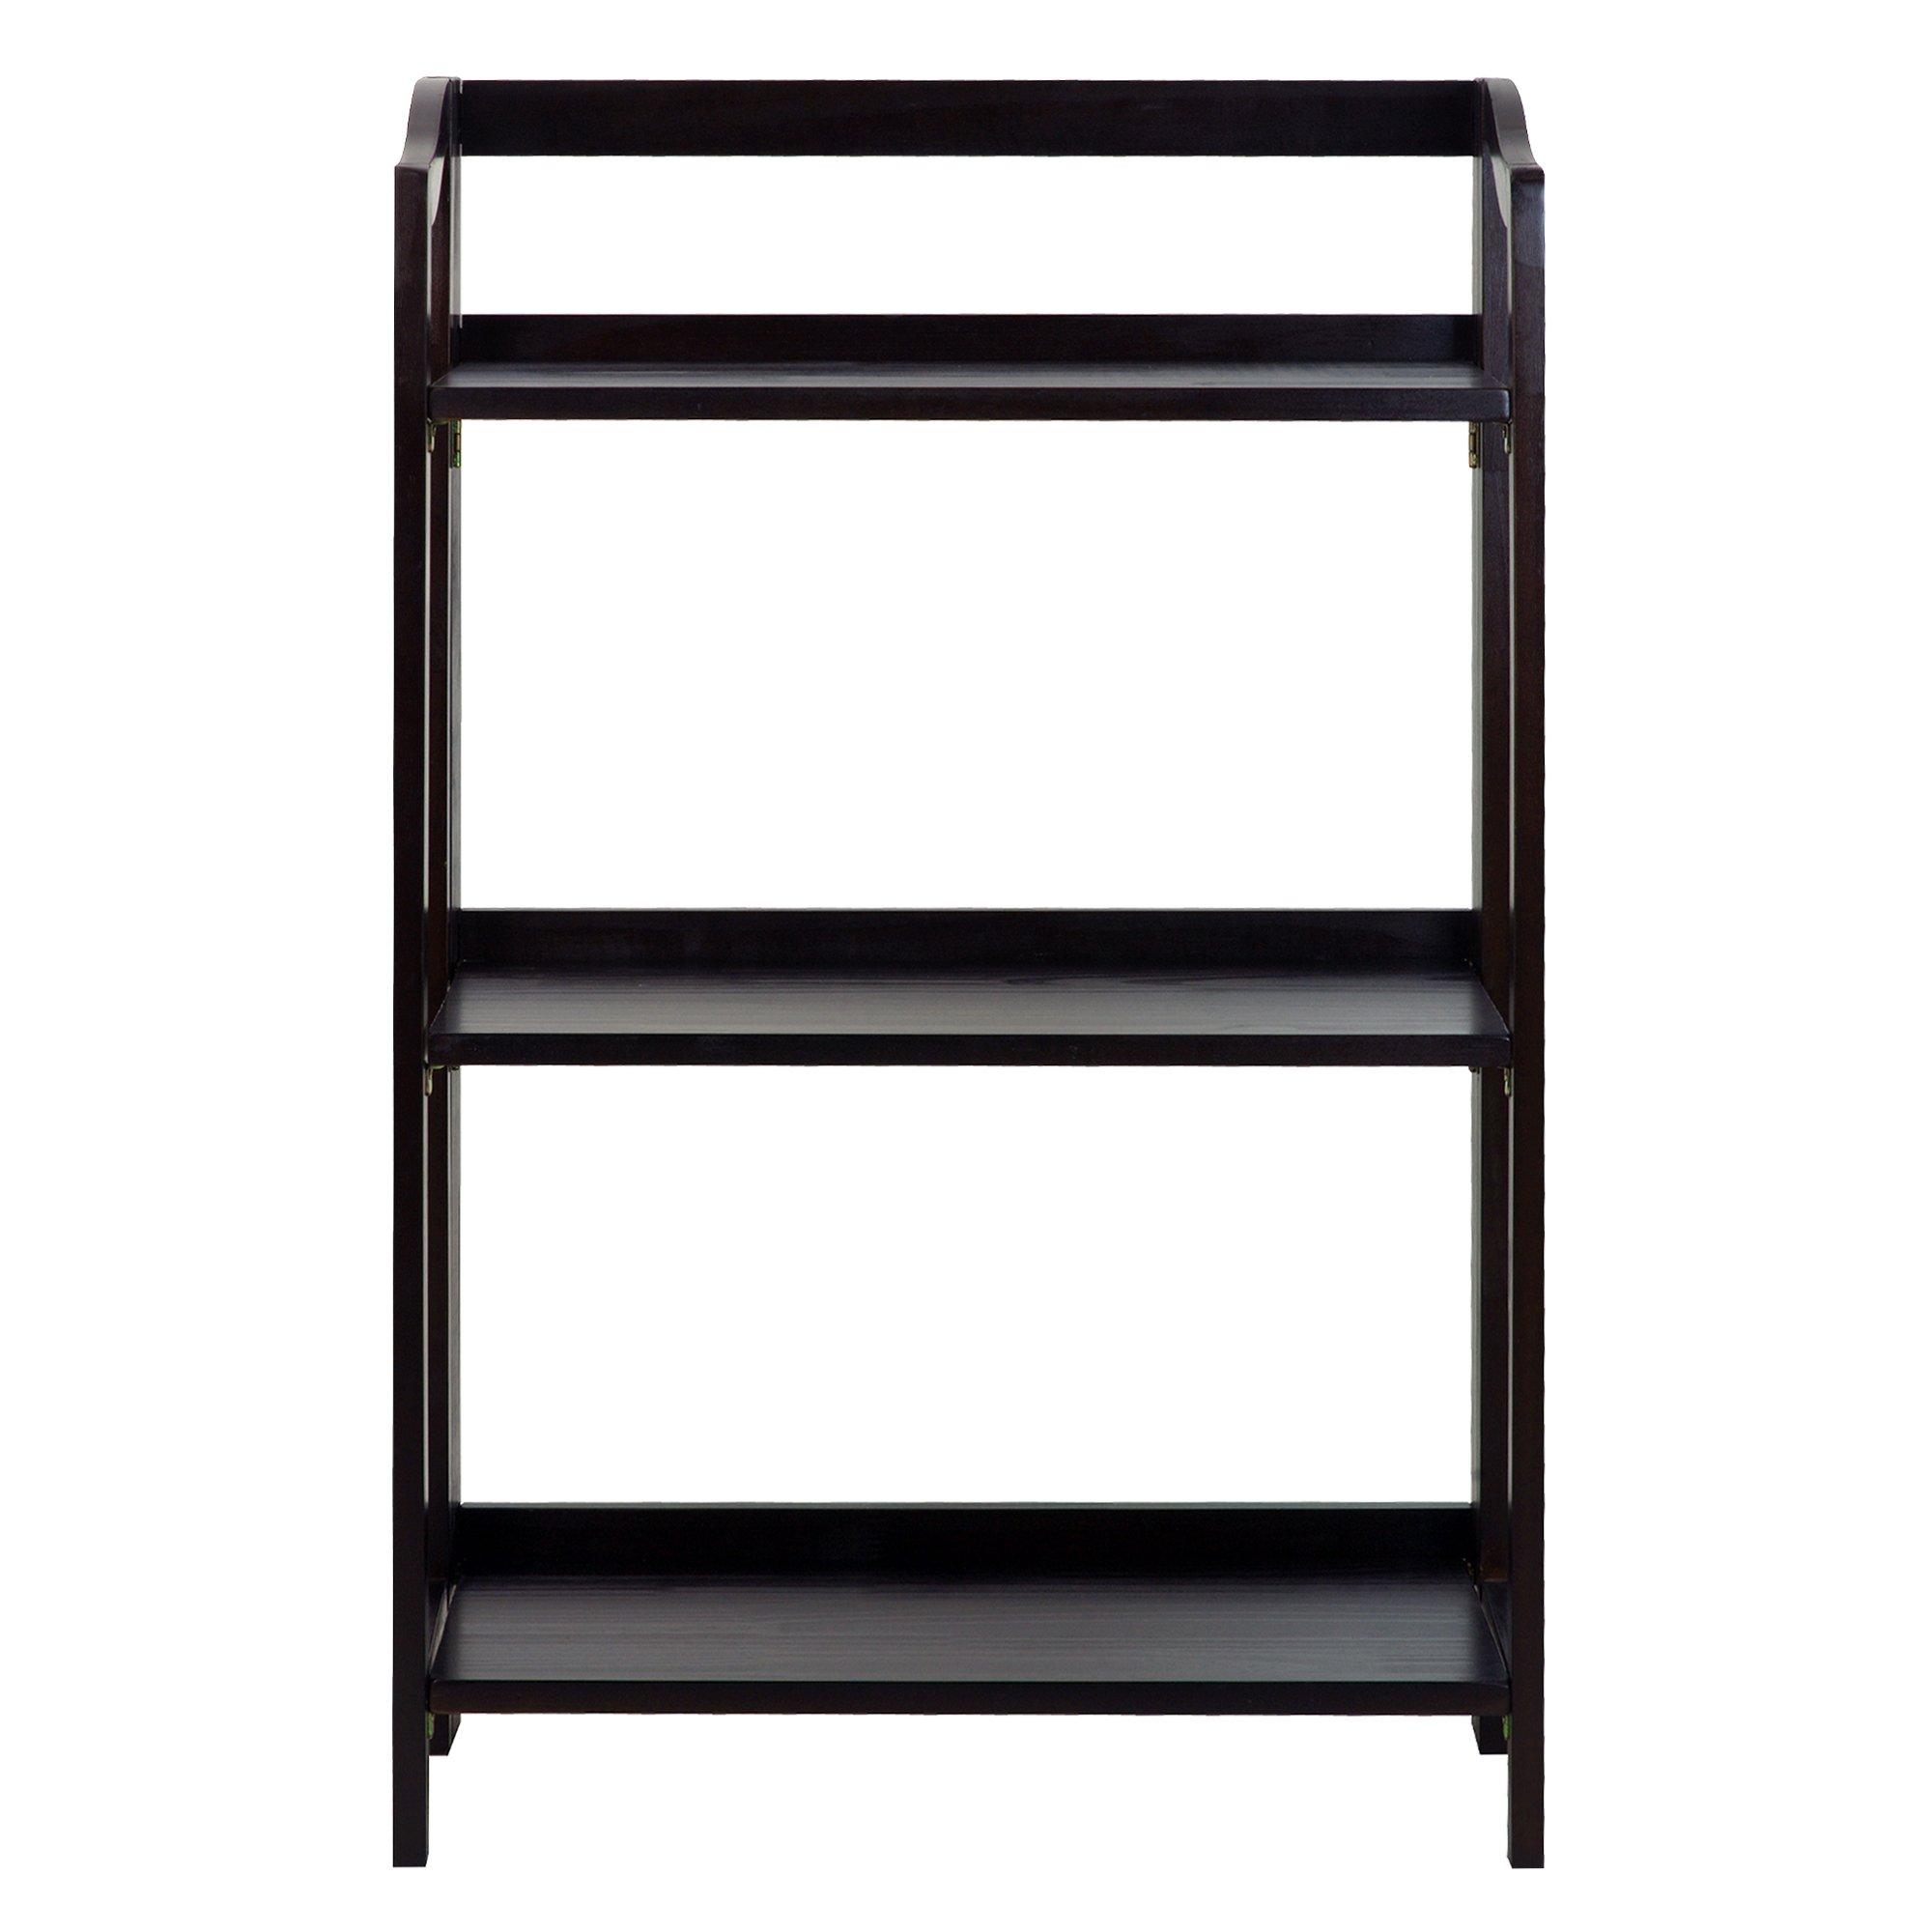 Casual Home 337-33 Stratford 3-Shelf Folding Bookcase-Espresso